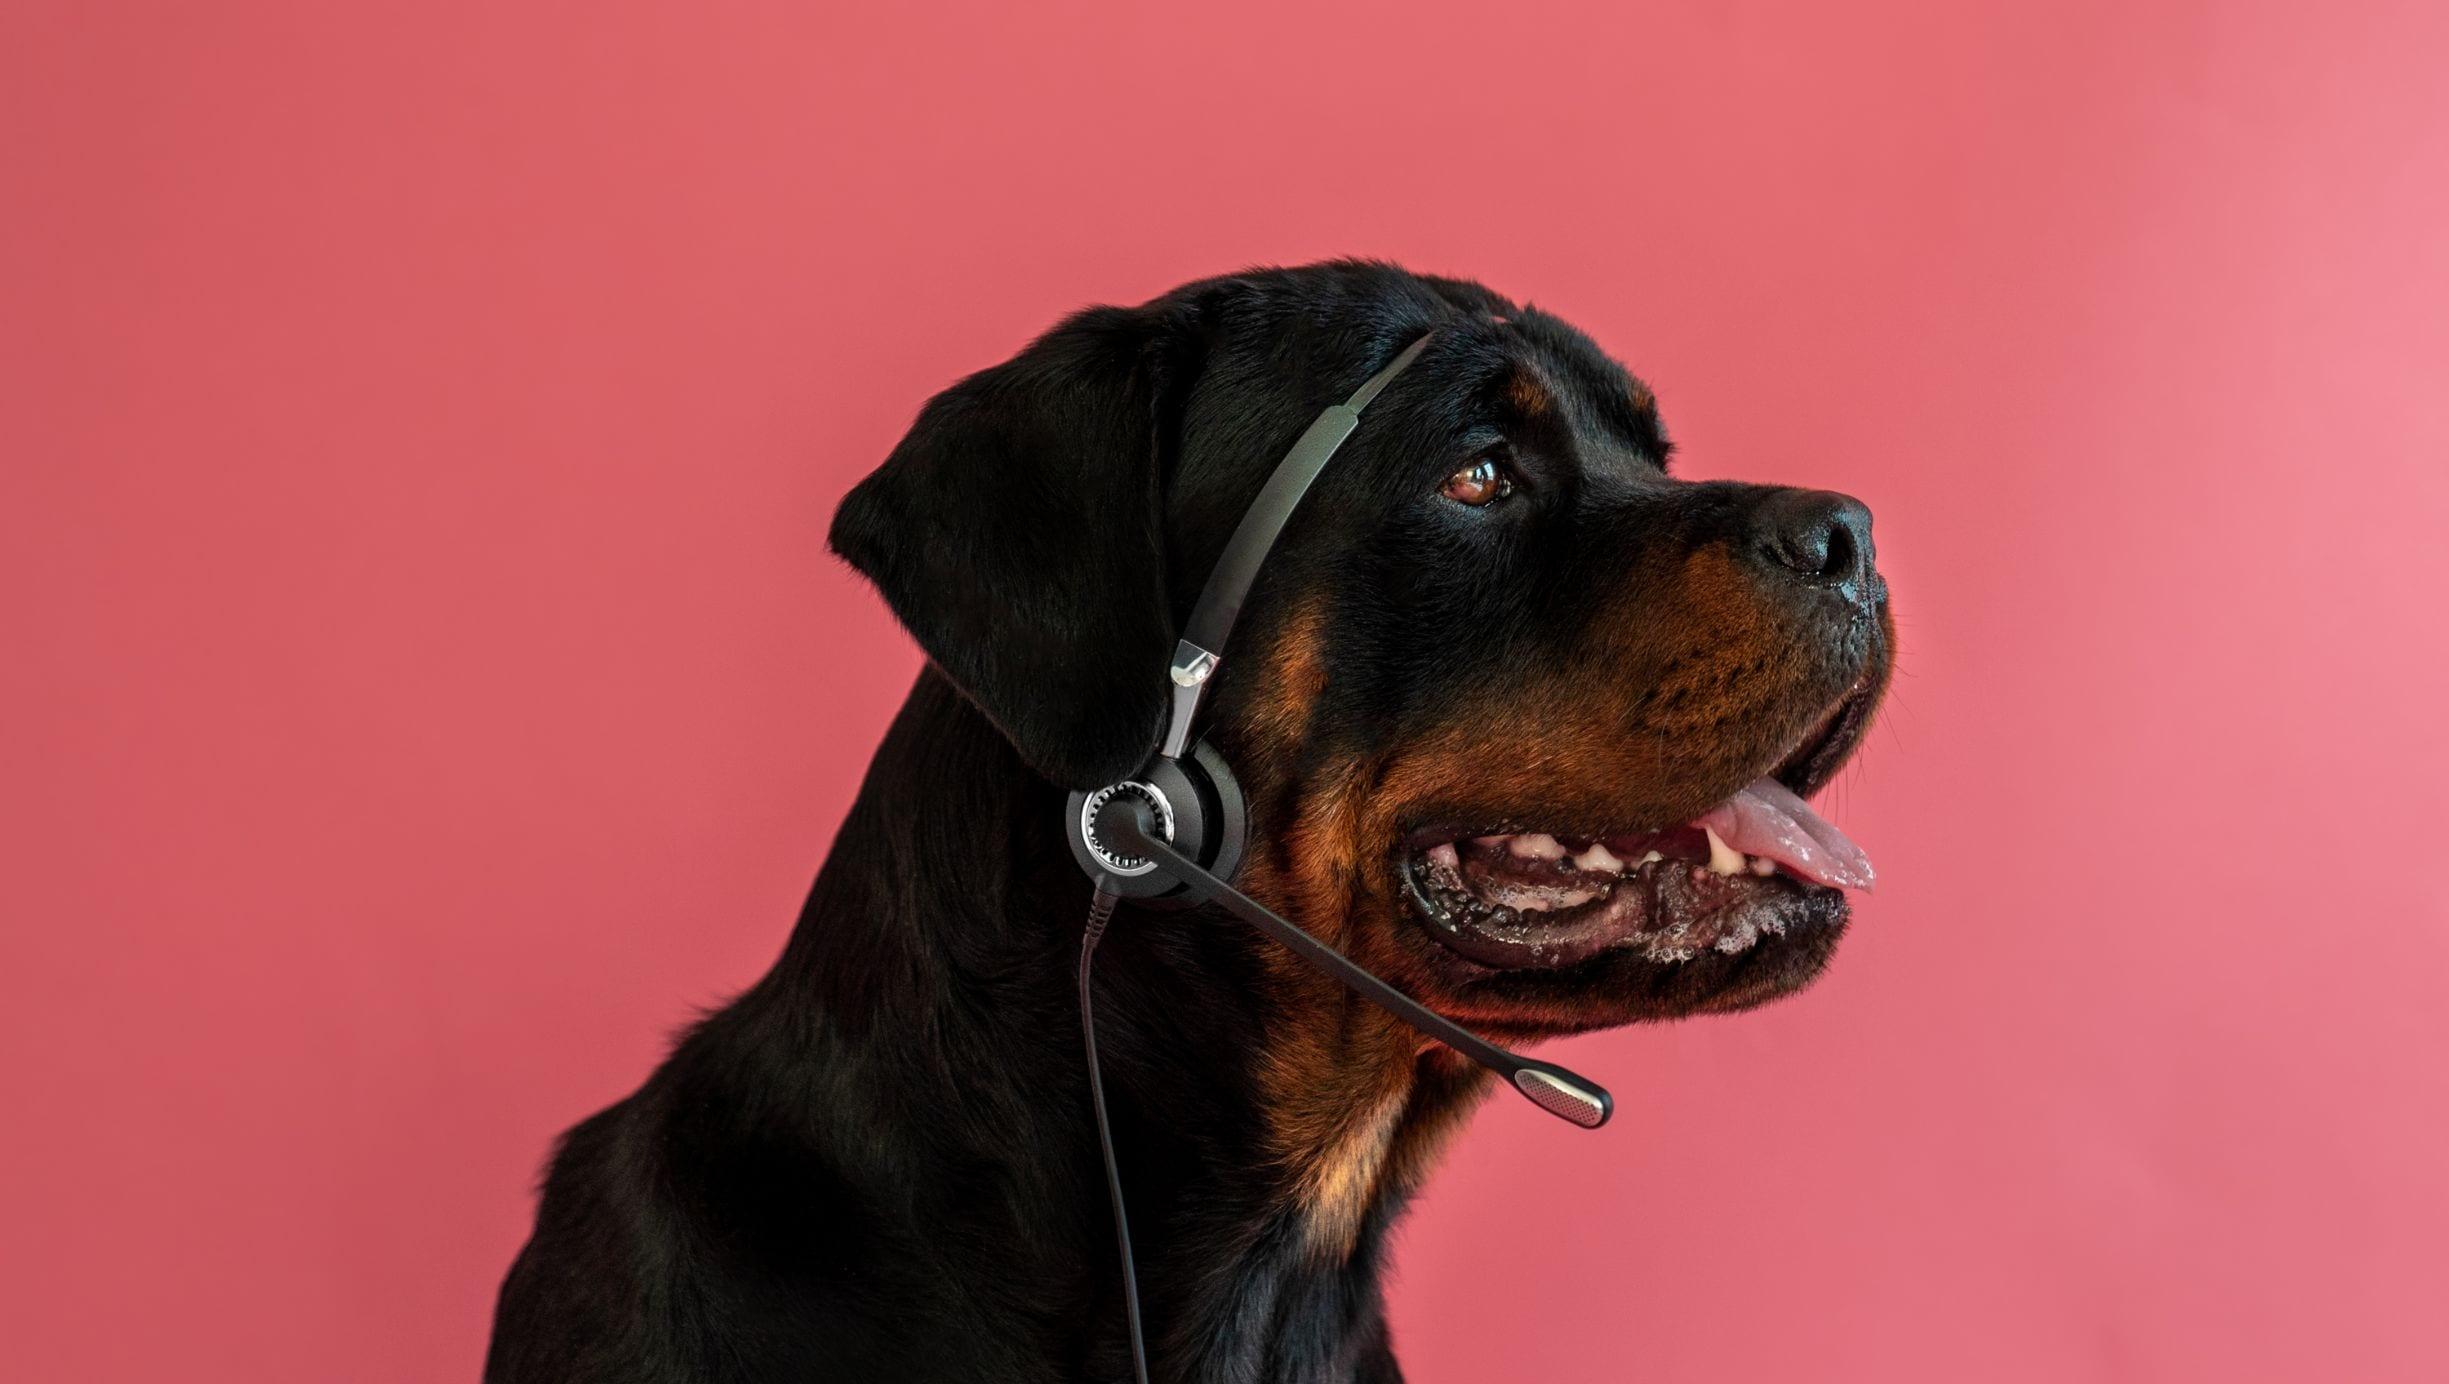 hund tager imod kundehenvendelser med høretelefoner og mikrofon påVuffeli hundeblog